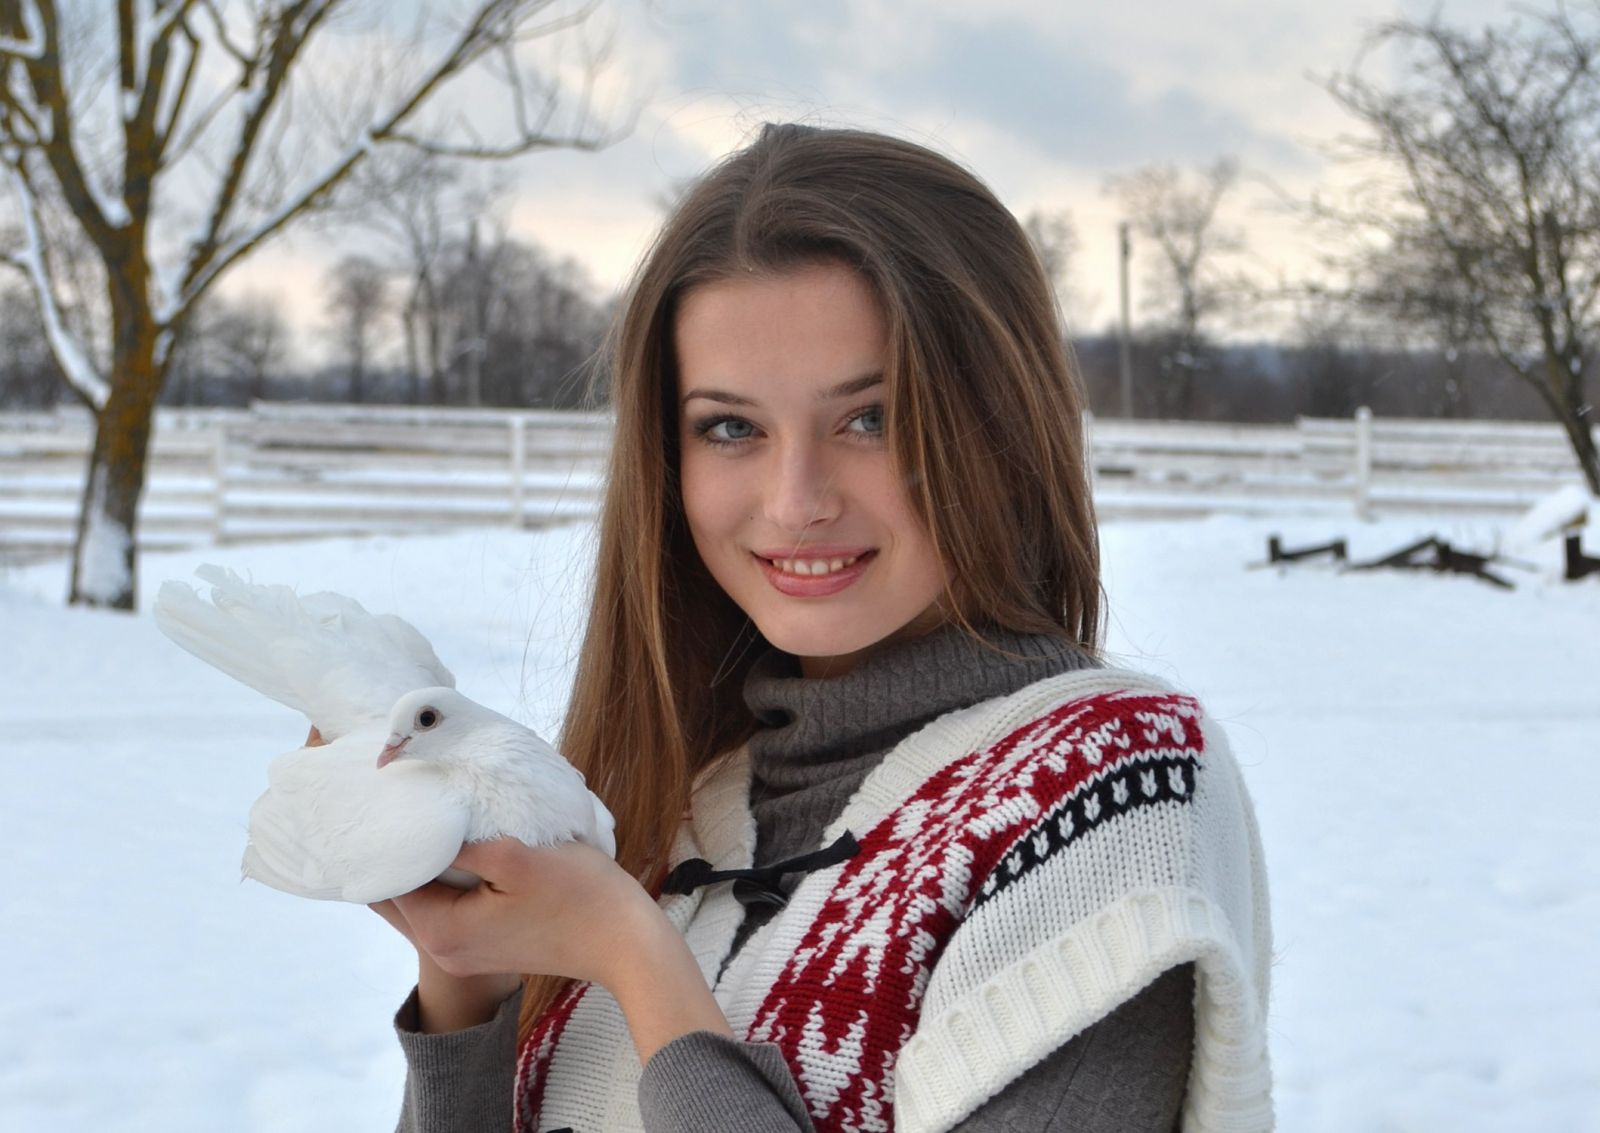 Анна Заячковская сбежала от богатого мужа из-за избиений - СМИ